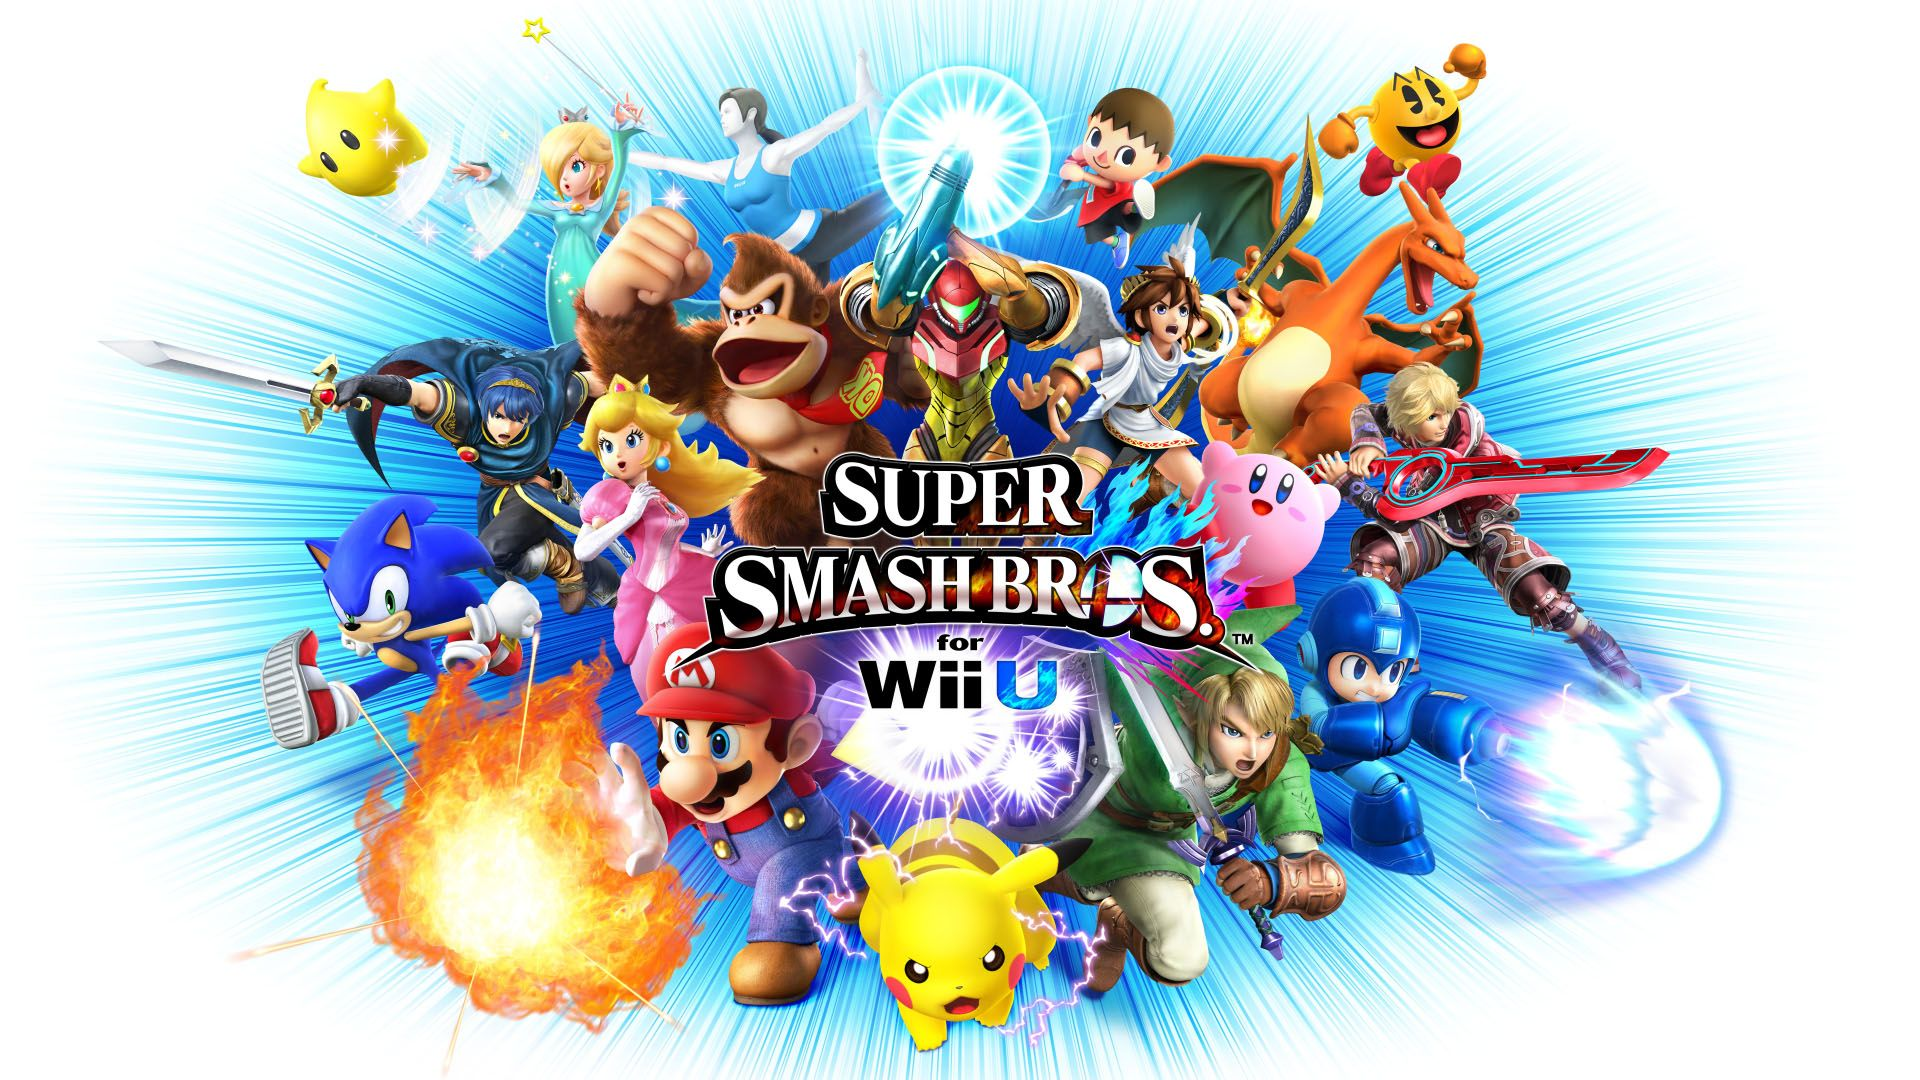 Super Smash Bros Wii U Wallpaper | Wallpaper HD 1080p | Smash bros